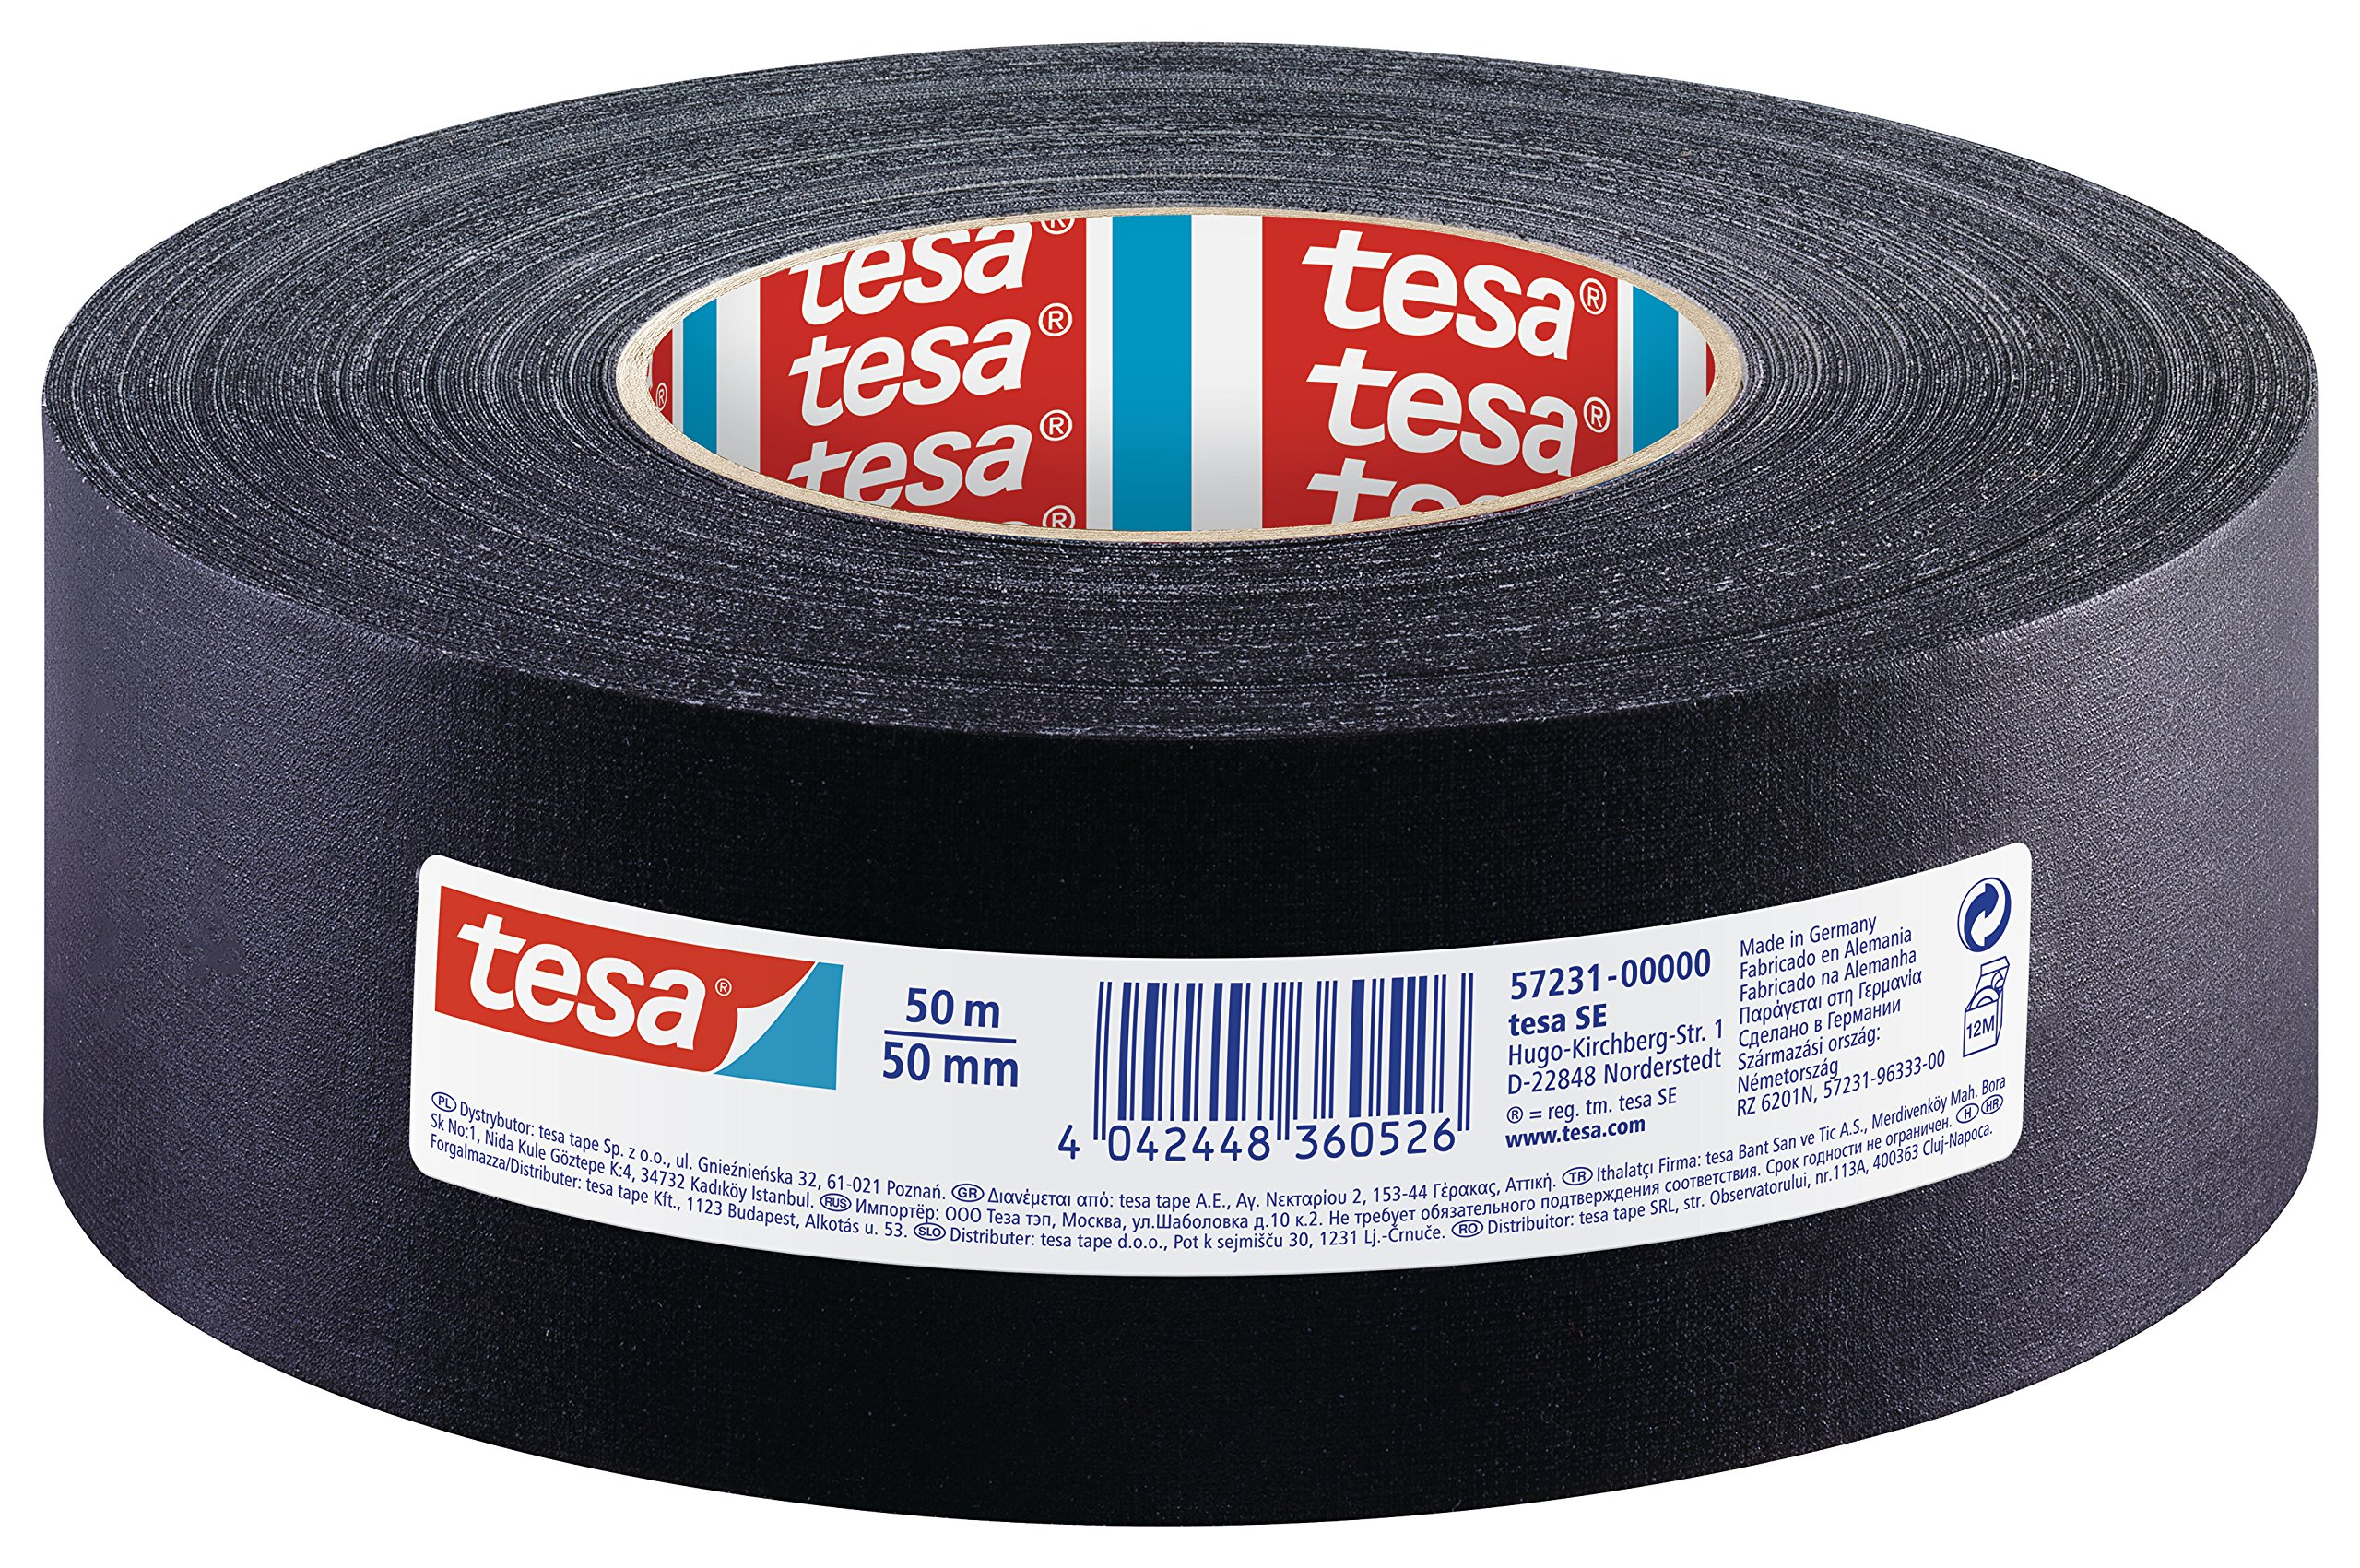 Tesa Extra Power Fabric Tape 19mm x 50m, Black, 57231-00000-02 by Tesa